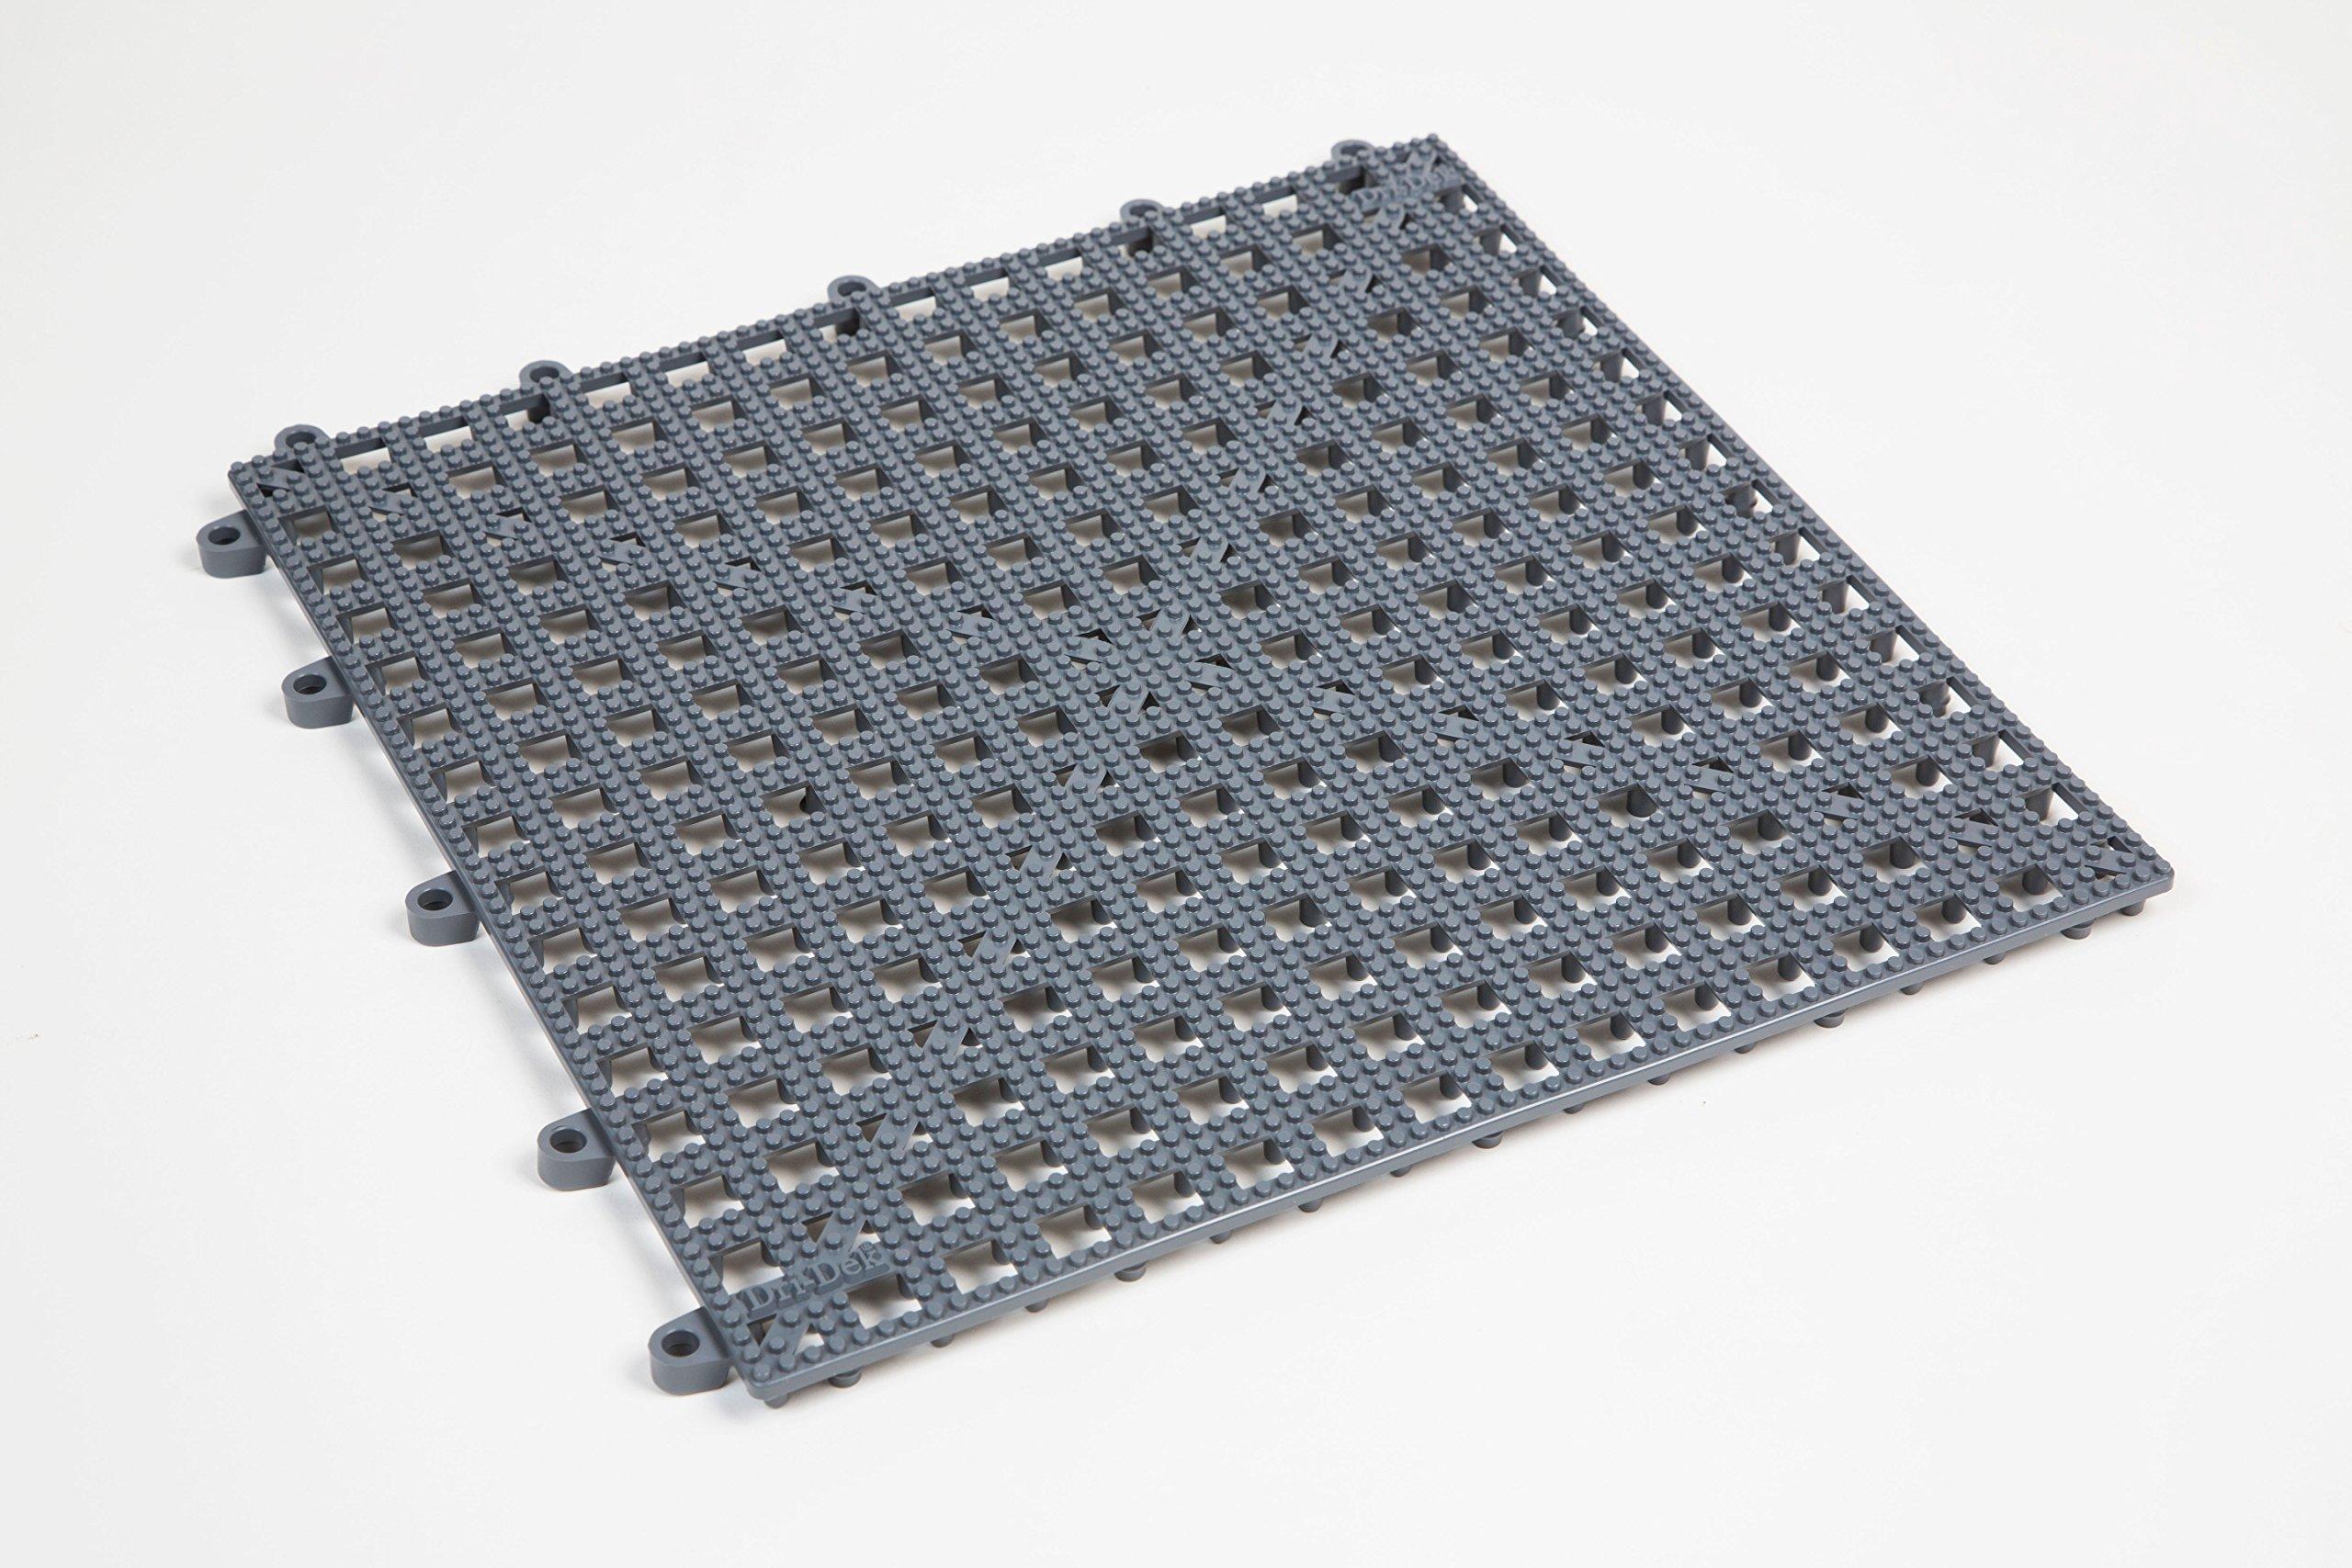 Dri-Dek 1'x1' Interlocking Tiles - Flexible Patio, Porch, Lanai, Balcony, Basement & Pool Deck Flooring (1'x1' Tiles - 50-Pack, Gray)